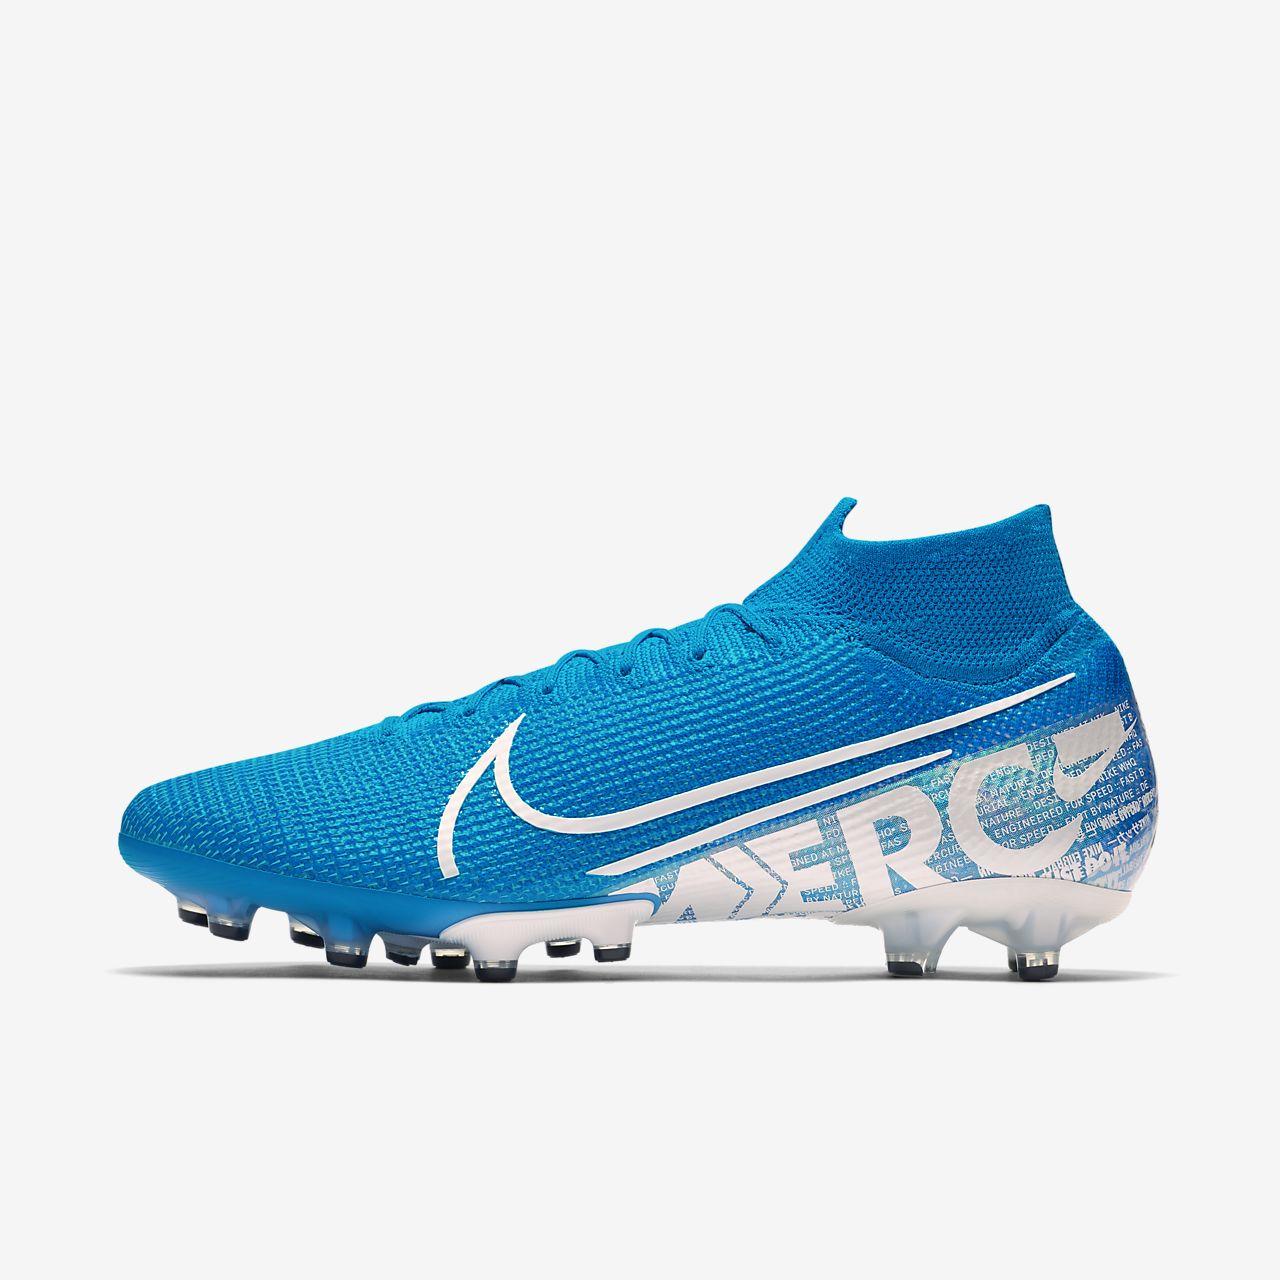 Calzado de fútbol para césped artificial Nike Mercurial Superfly 7 Elite AG-PRO